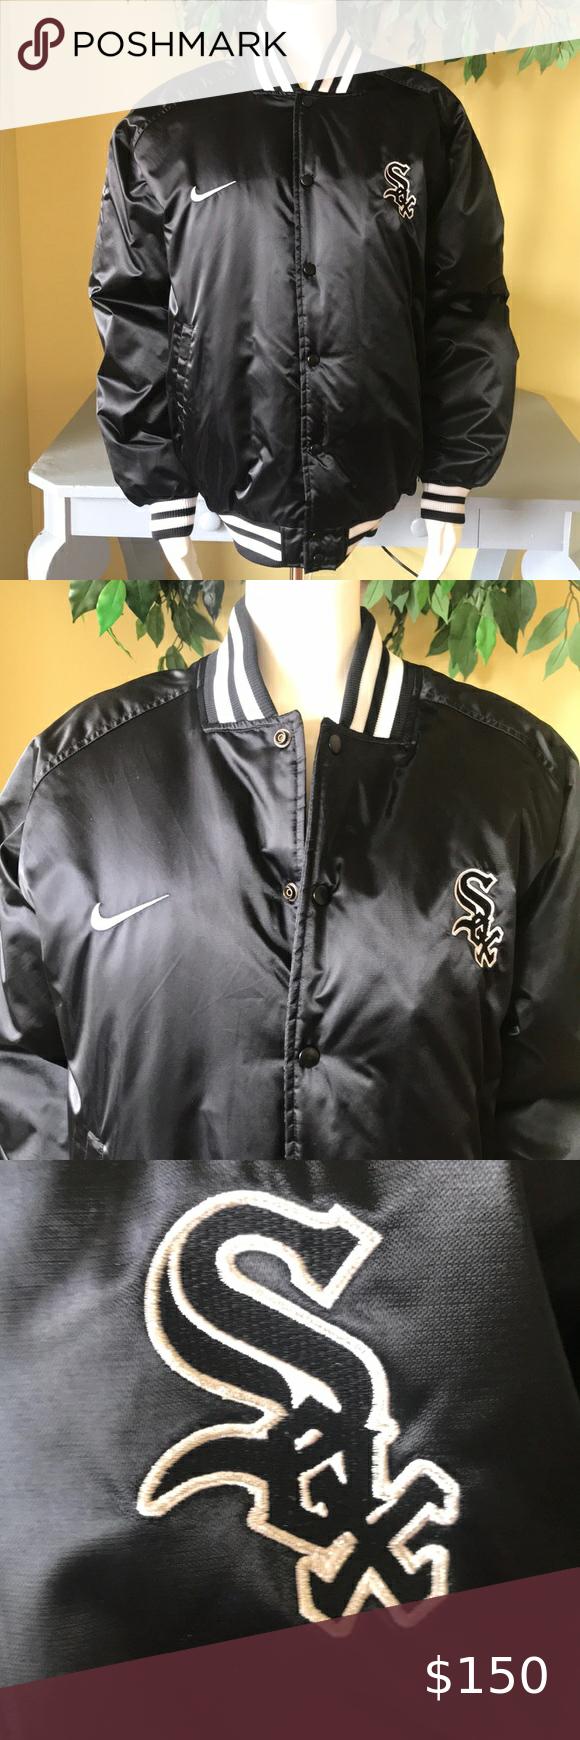 Men S Nike Chicago White Sox Bomber Jacket Size Xl Bomber Jacket Nike Bomber Jacket Jackets [ 1740 x 580 Pixel ]